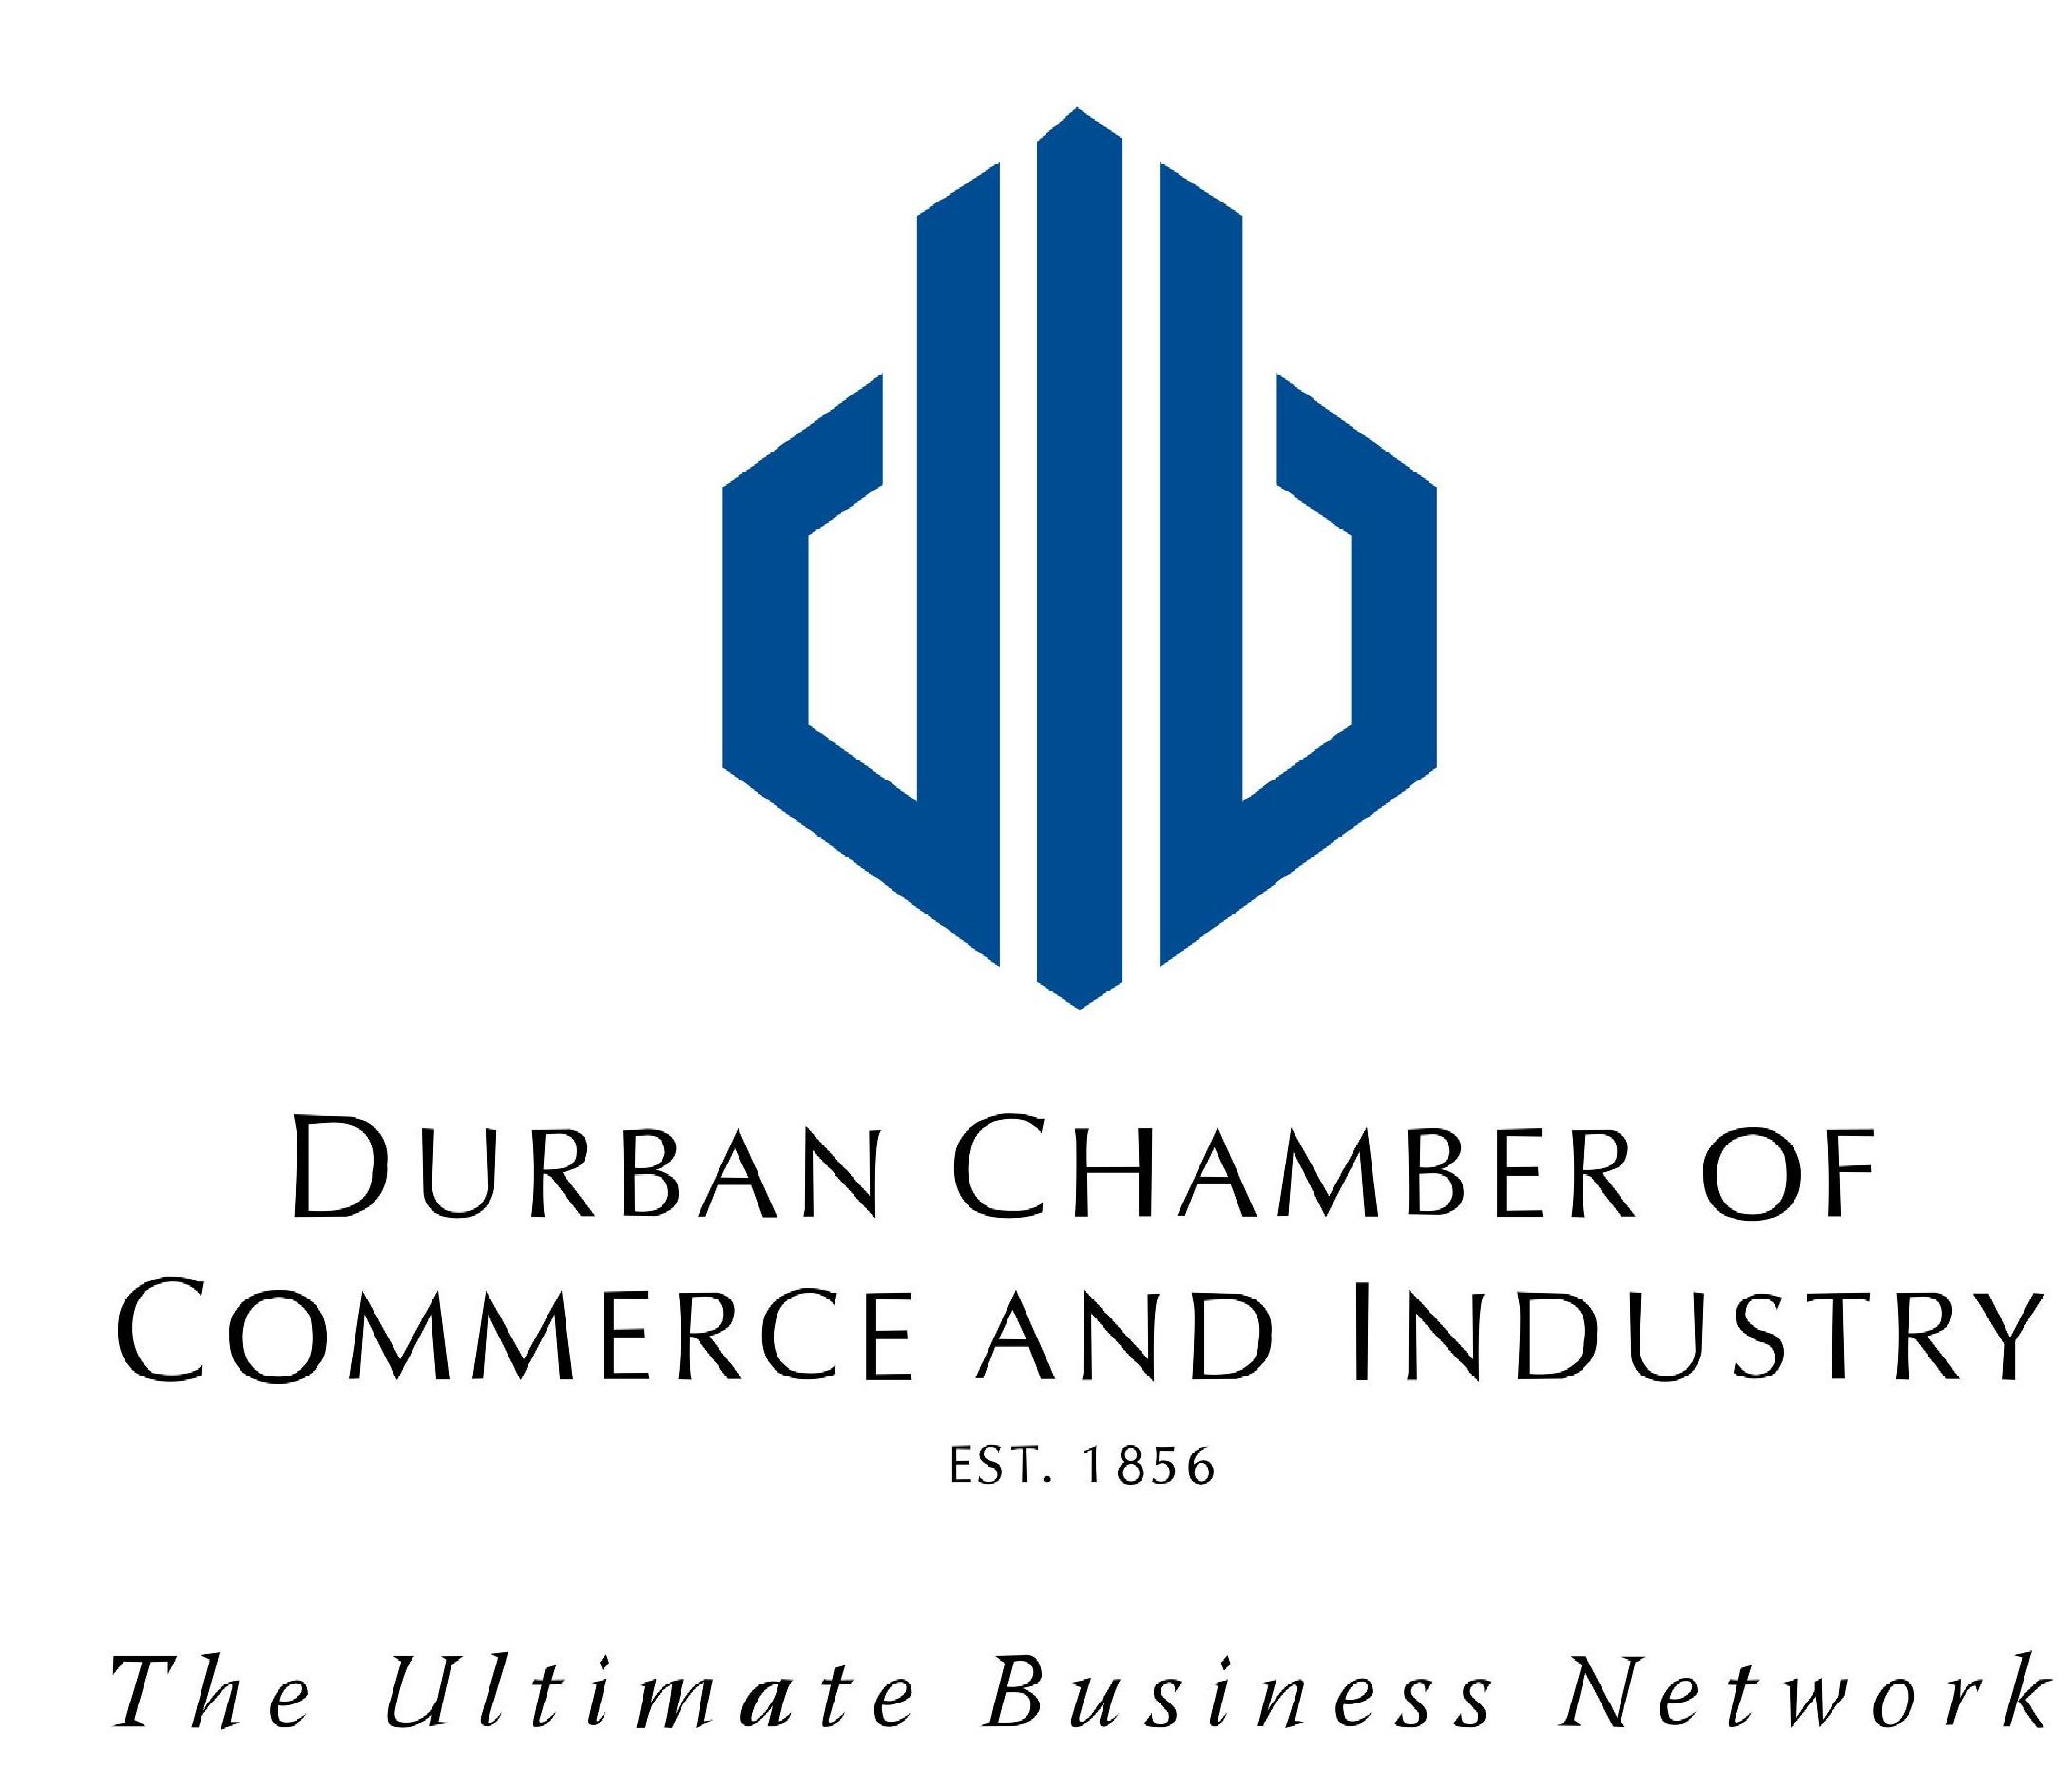 Durban Chamber of Commerce